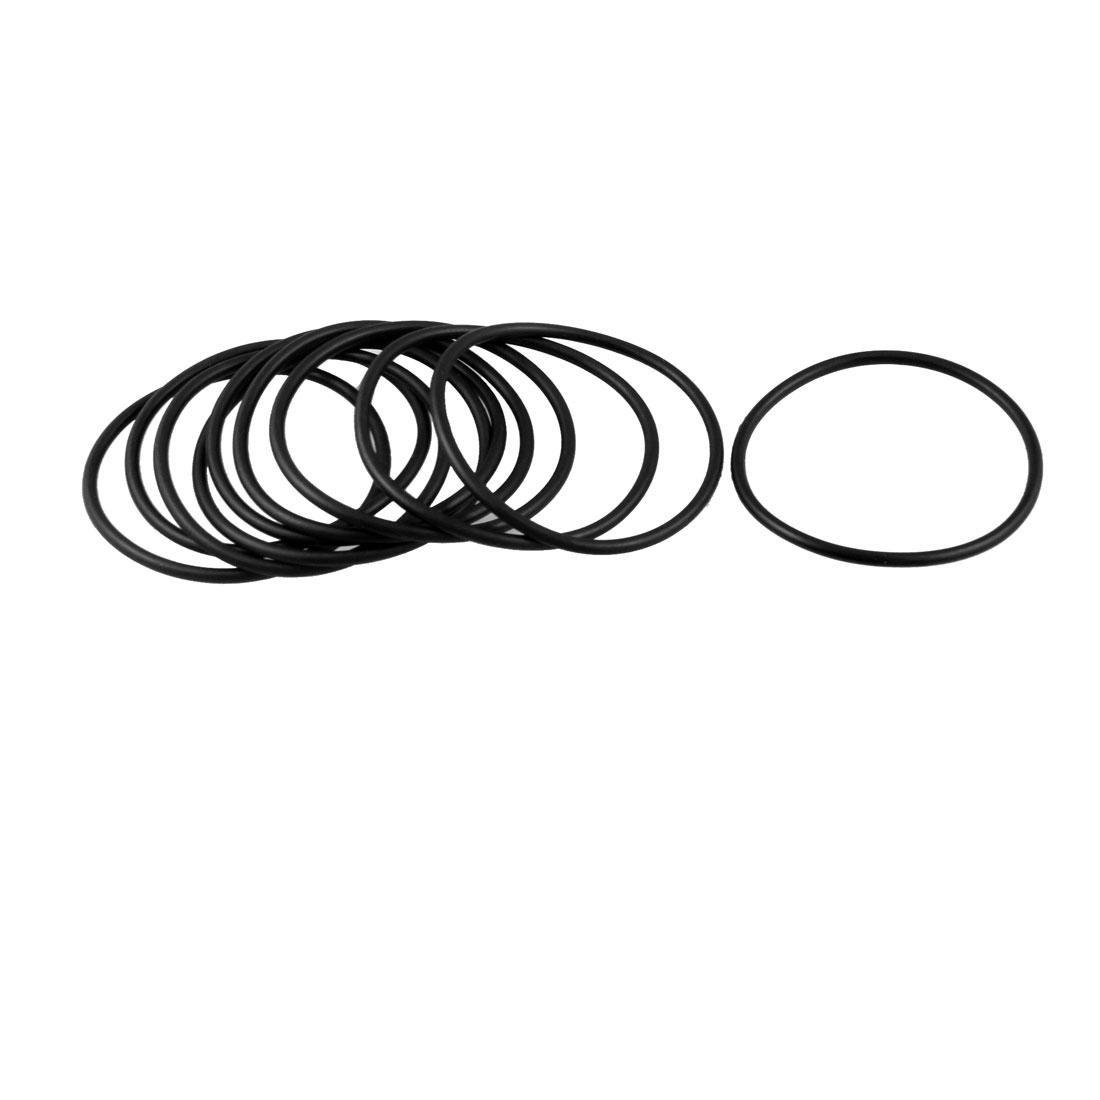 10 Pcs 63mm x 3.1mm Flexible Rubber O Rings Sealing Washer Black